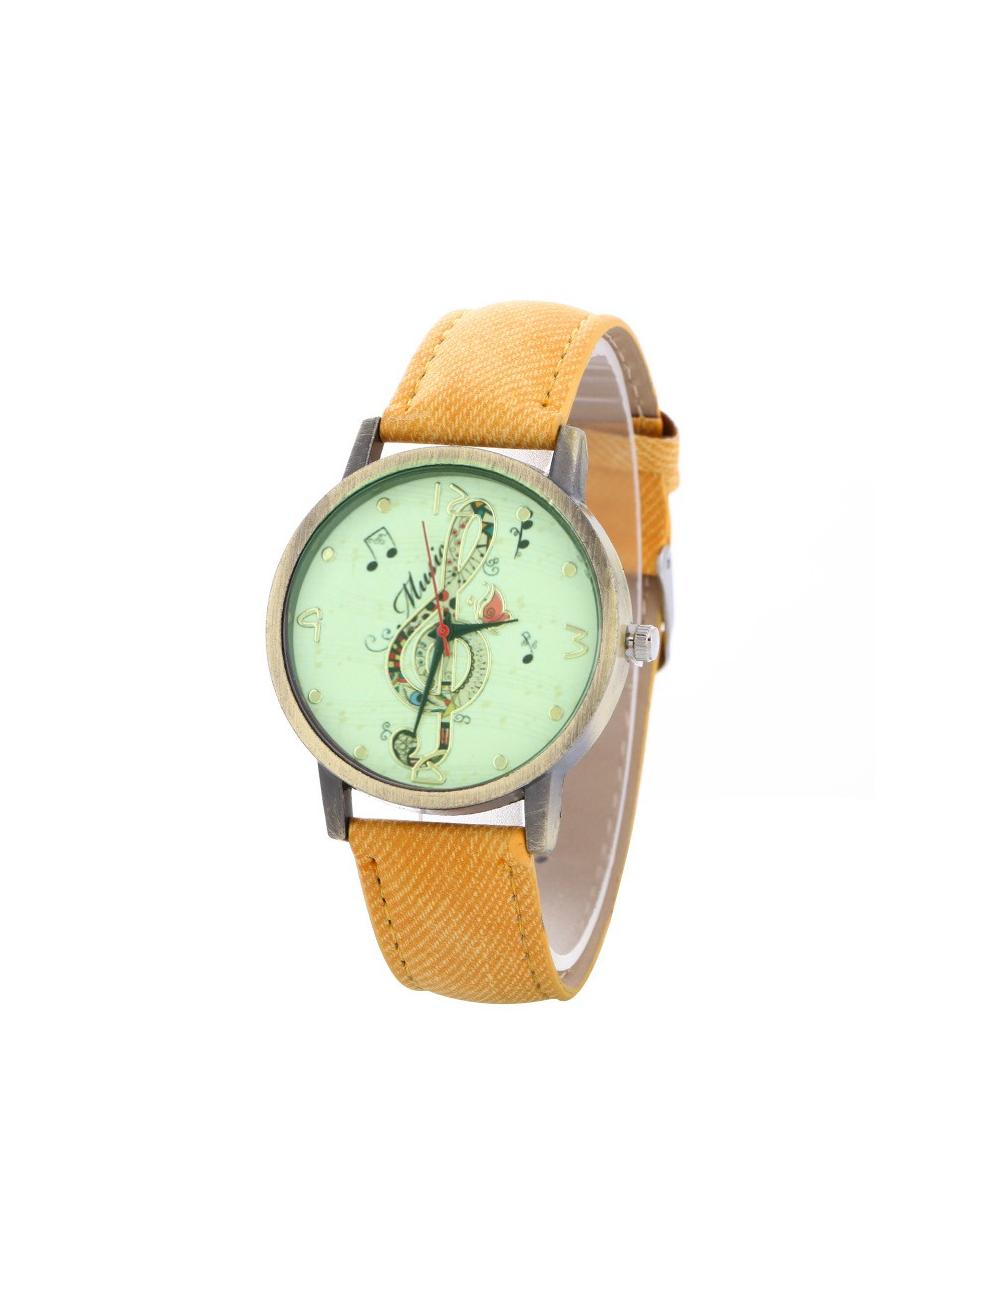 Reloj Nota Musical Dayoshop 31,900.00